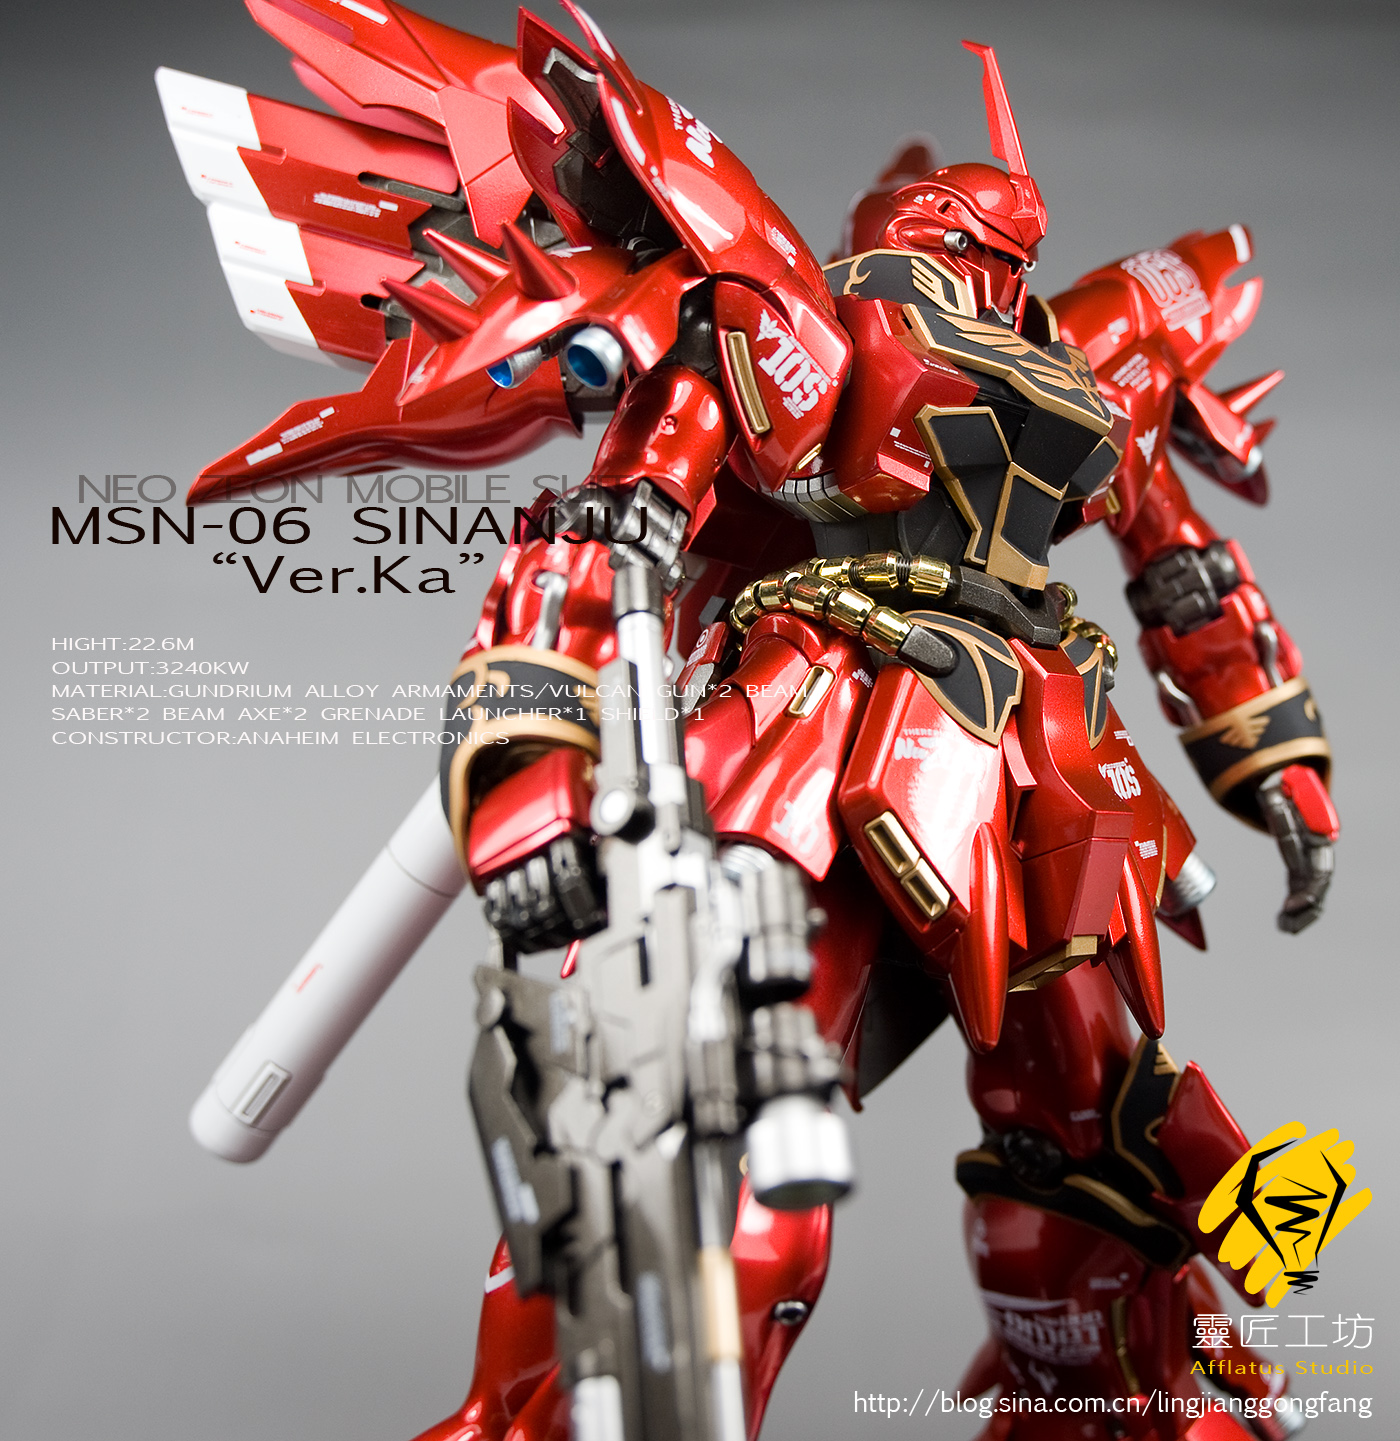 GUNDAM GUY: MG 1/100 MSN-06 Sinanju Ver. Ka - Painted Build